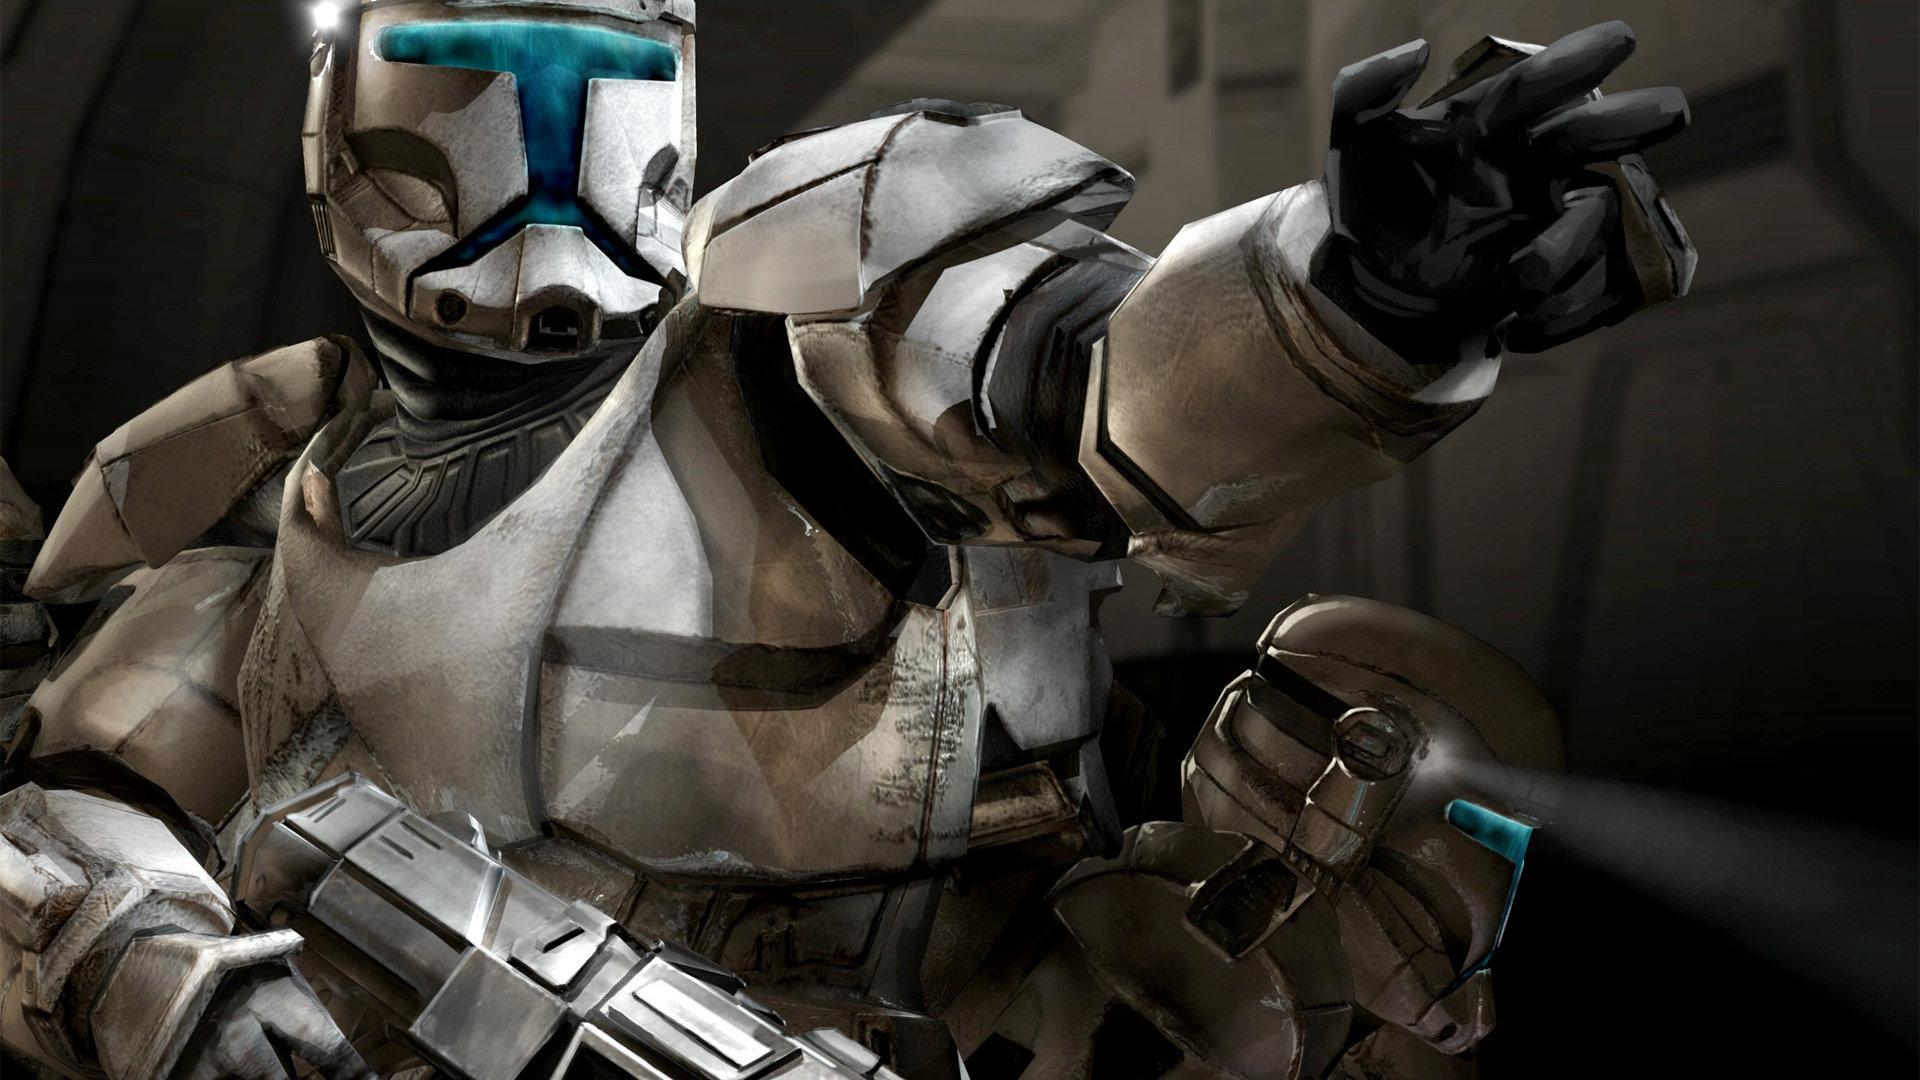 Star Wars Clone Wars Wallpaper: 4 Star Wars: Republic Commando HD Wallpapers